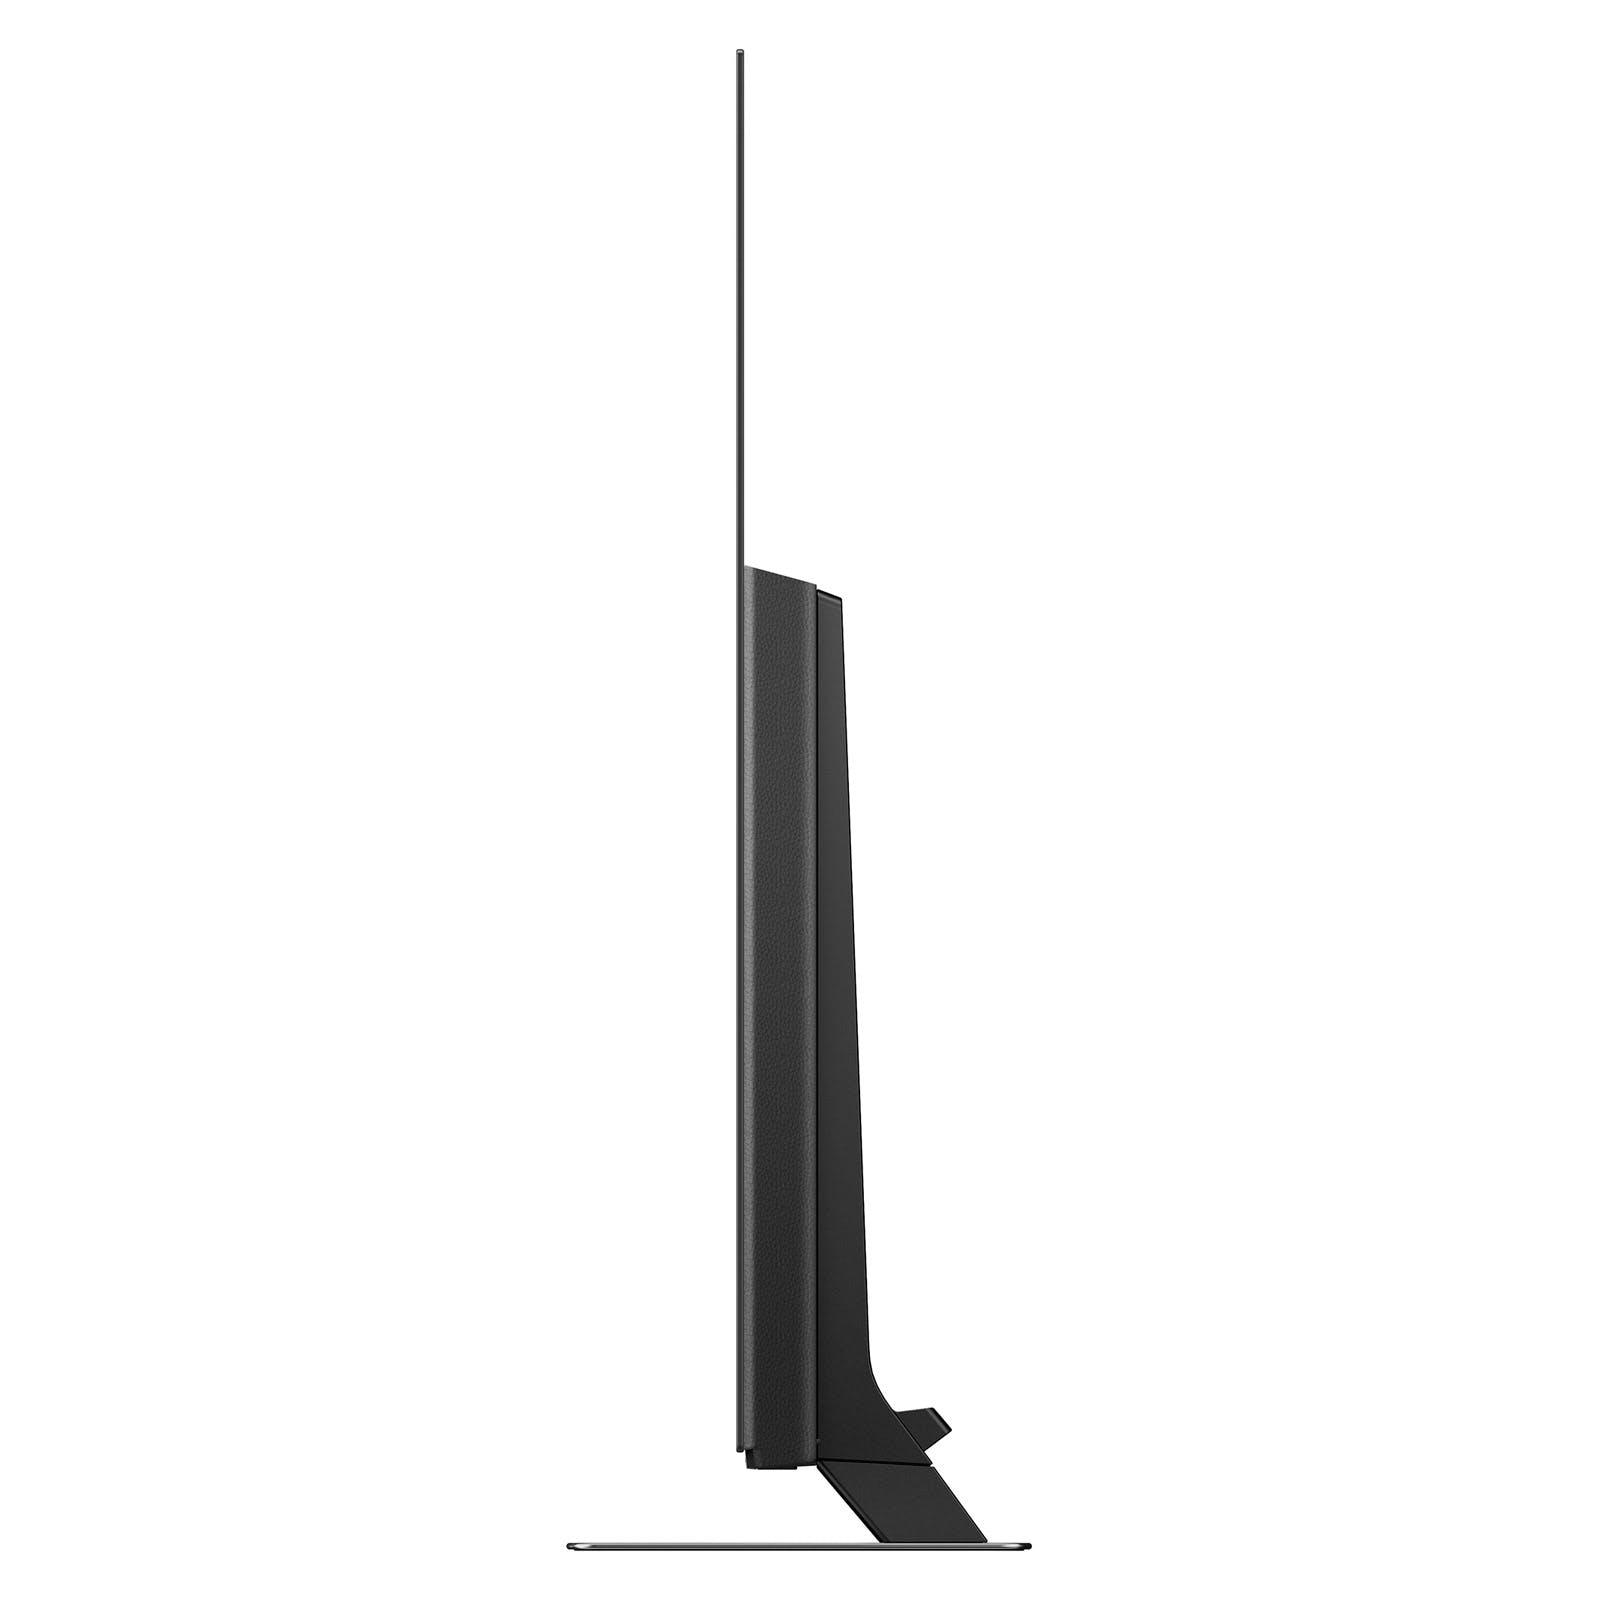 panasonic tx55ez952b 55 4k hdr uhd smart oled tv thx certified 4k display